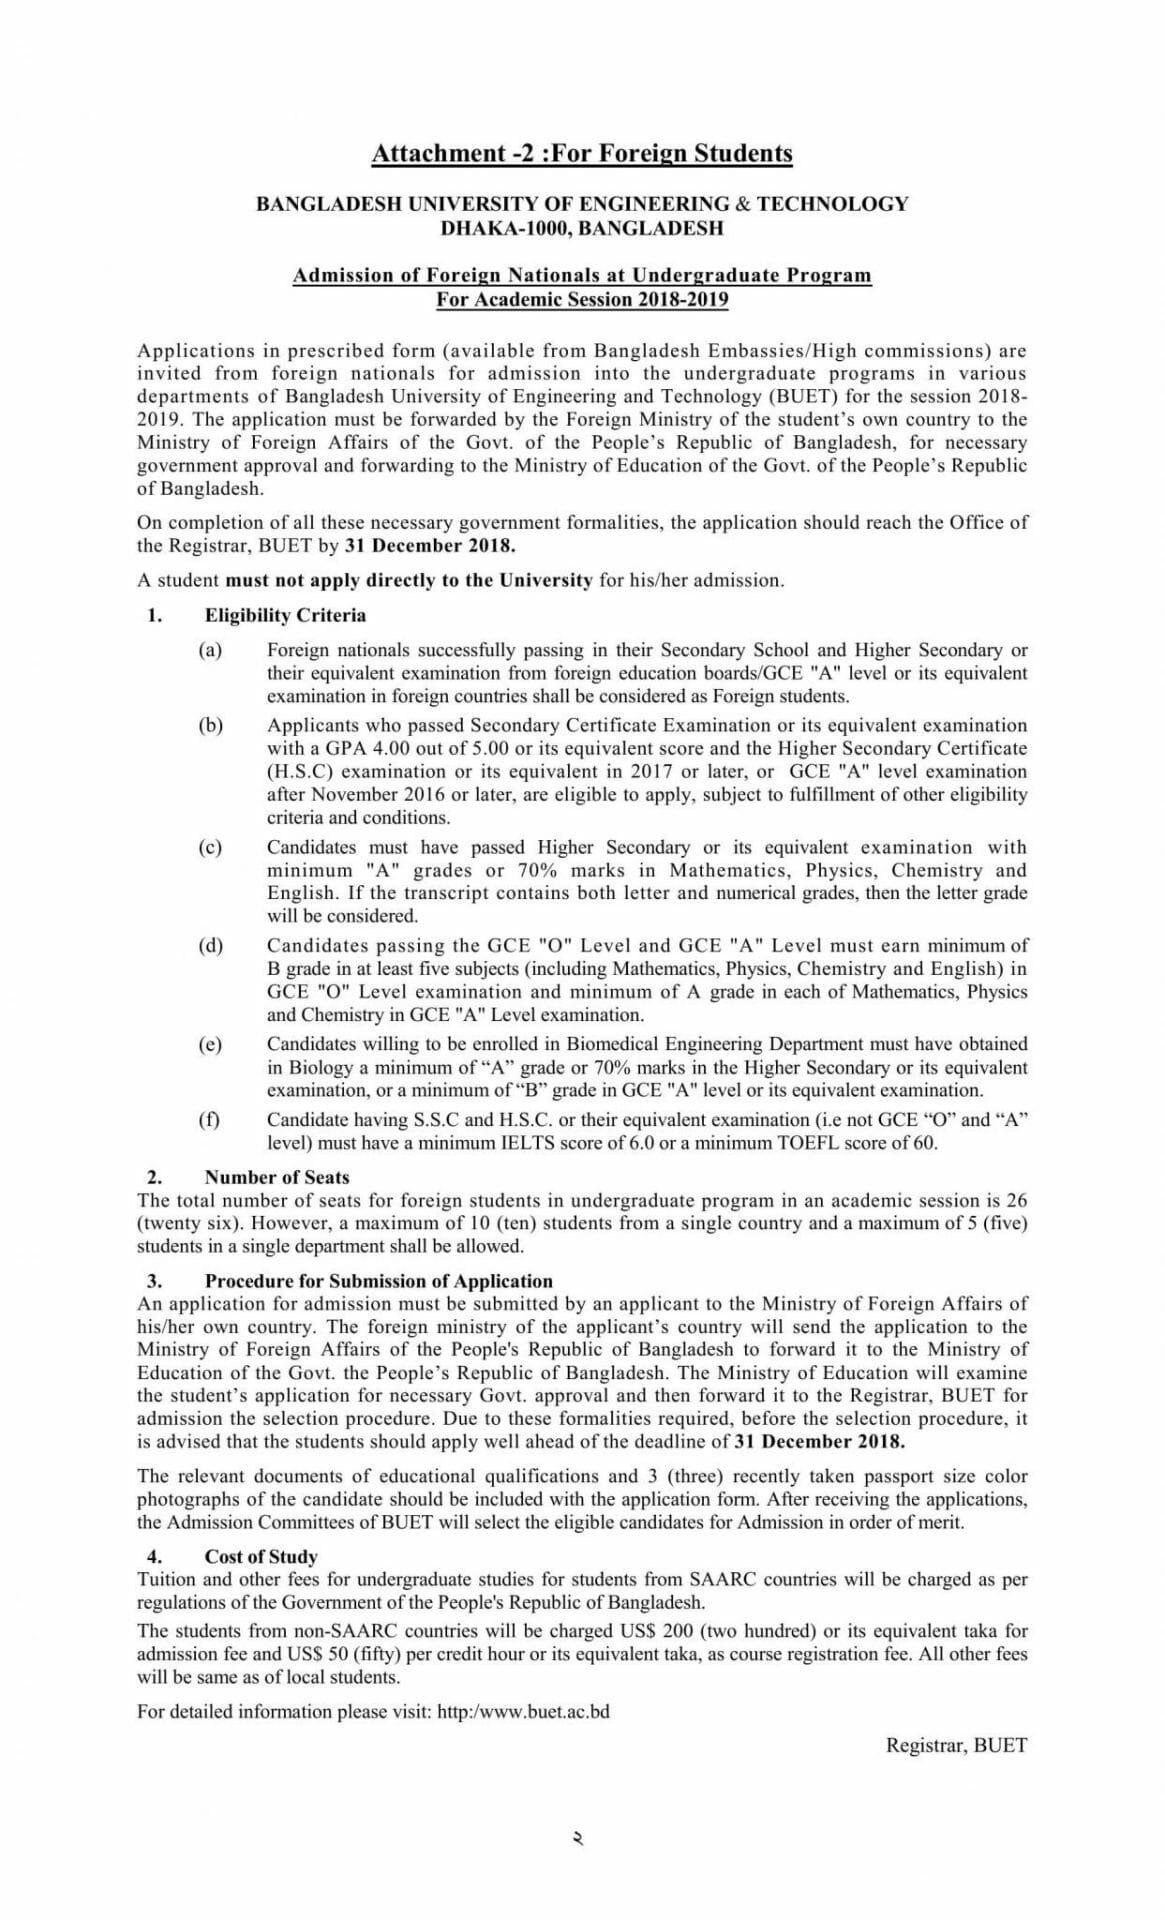 Bangladesh University of Engineering & Technology Admission Circular-1